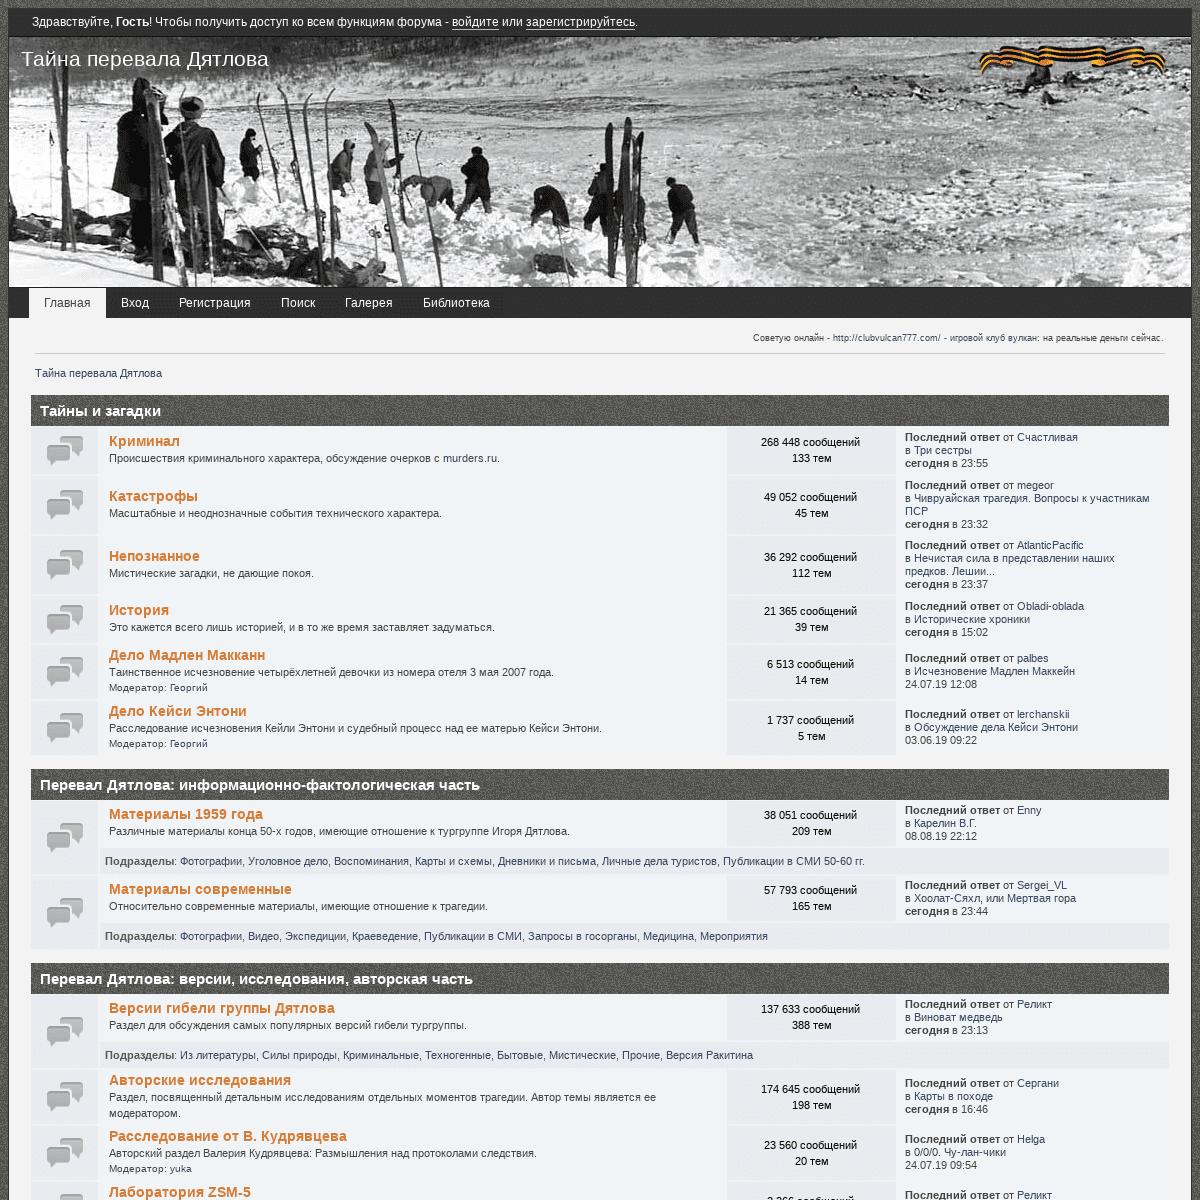 ArchiveBay.com - taina.li - Перевал Дятлова, тайна перевала Дятлова - версии, фото, материалы. Фору